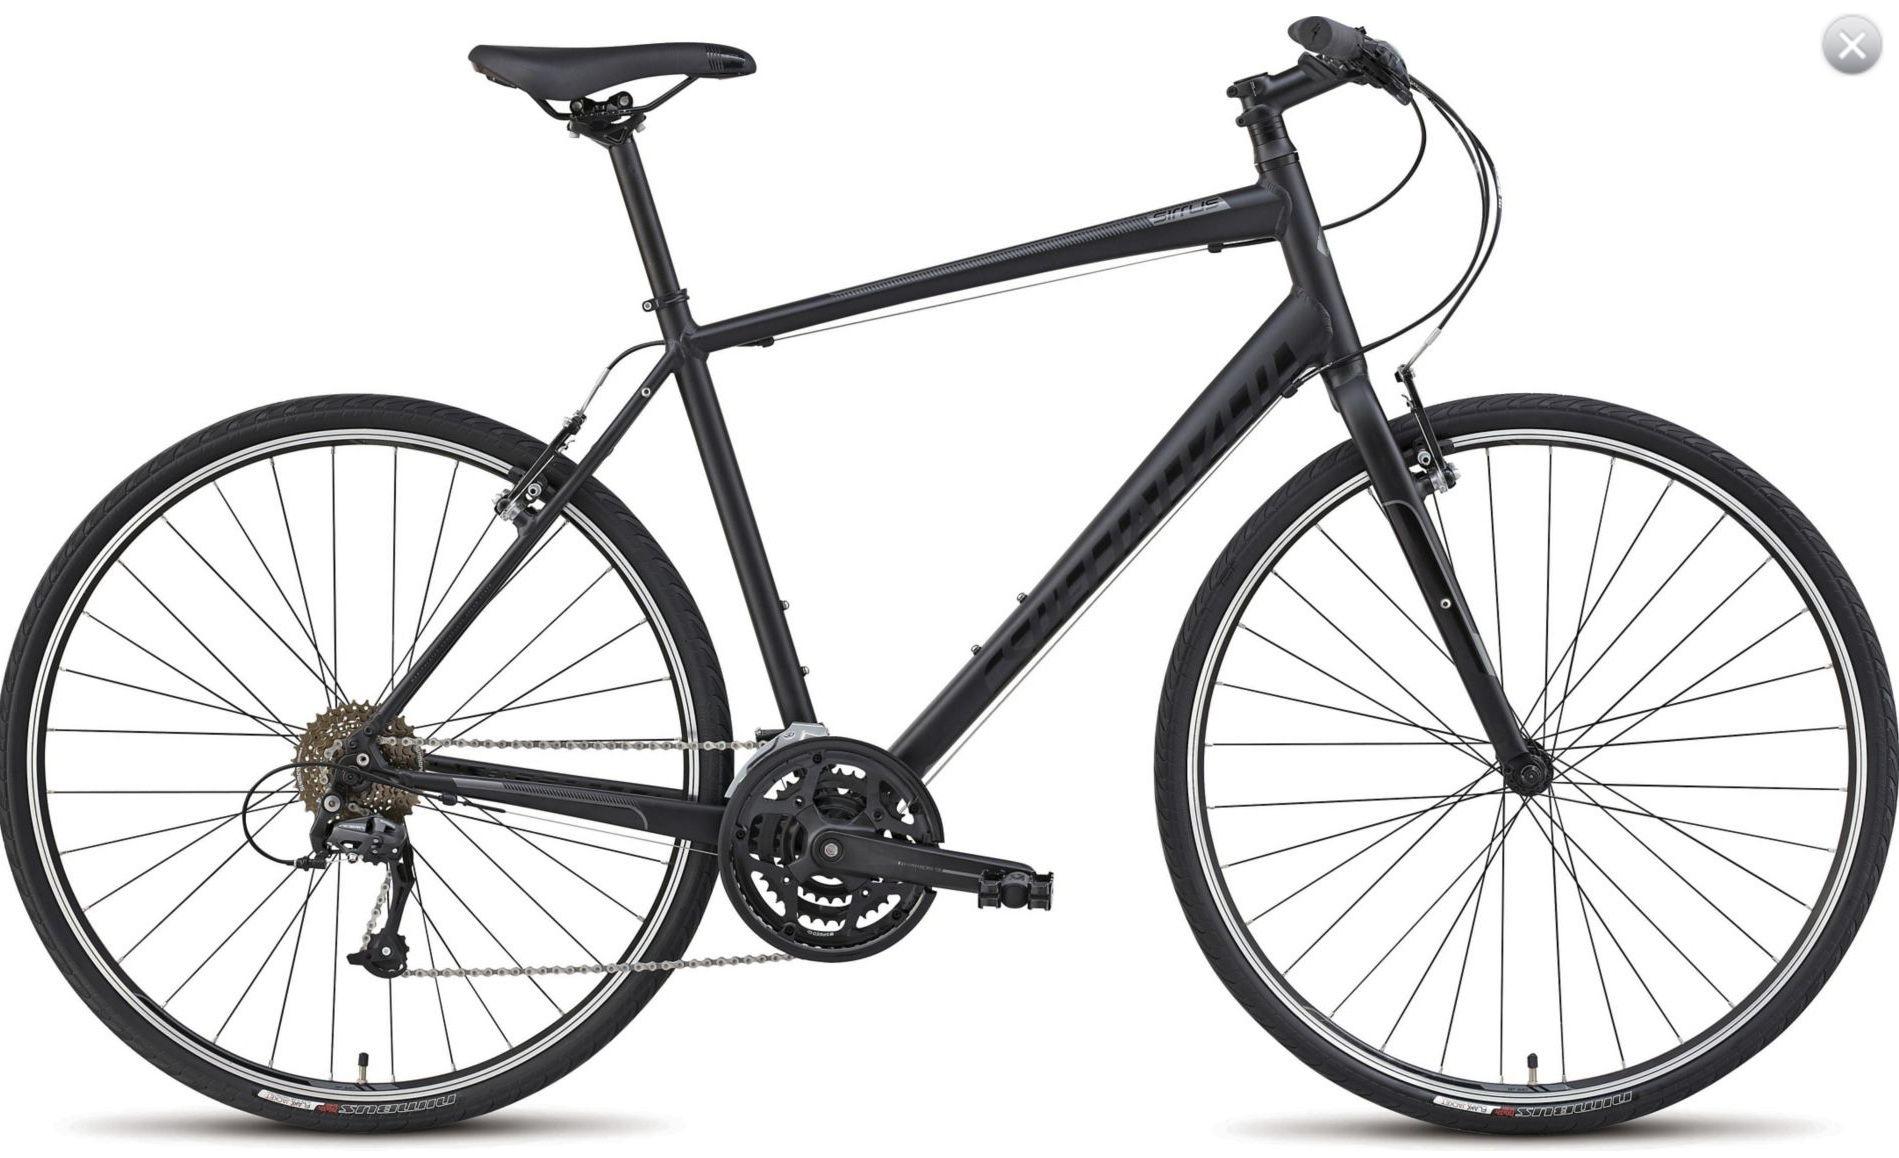 New bike Specialized Sirrus Sport Nice Products